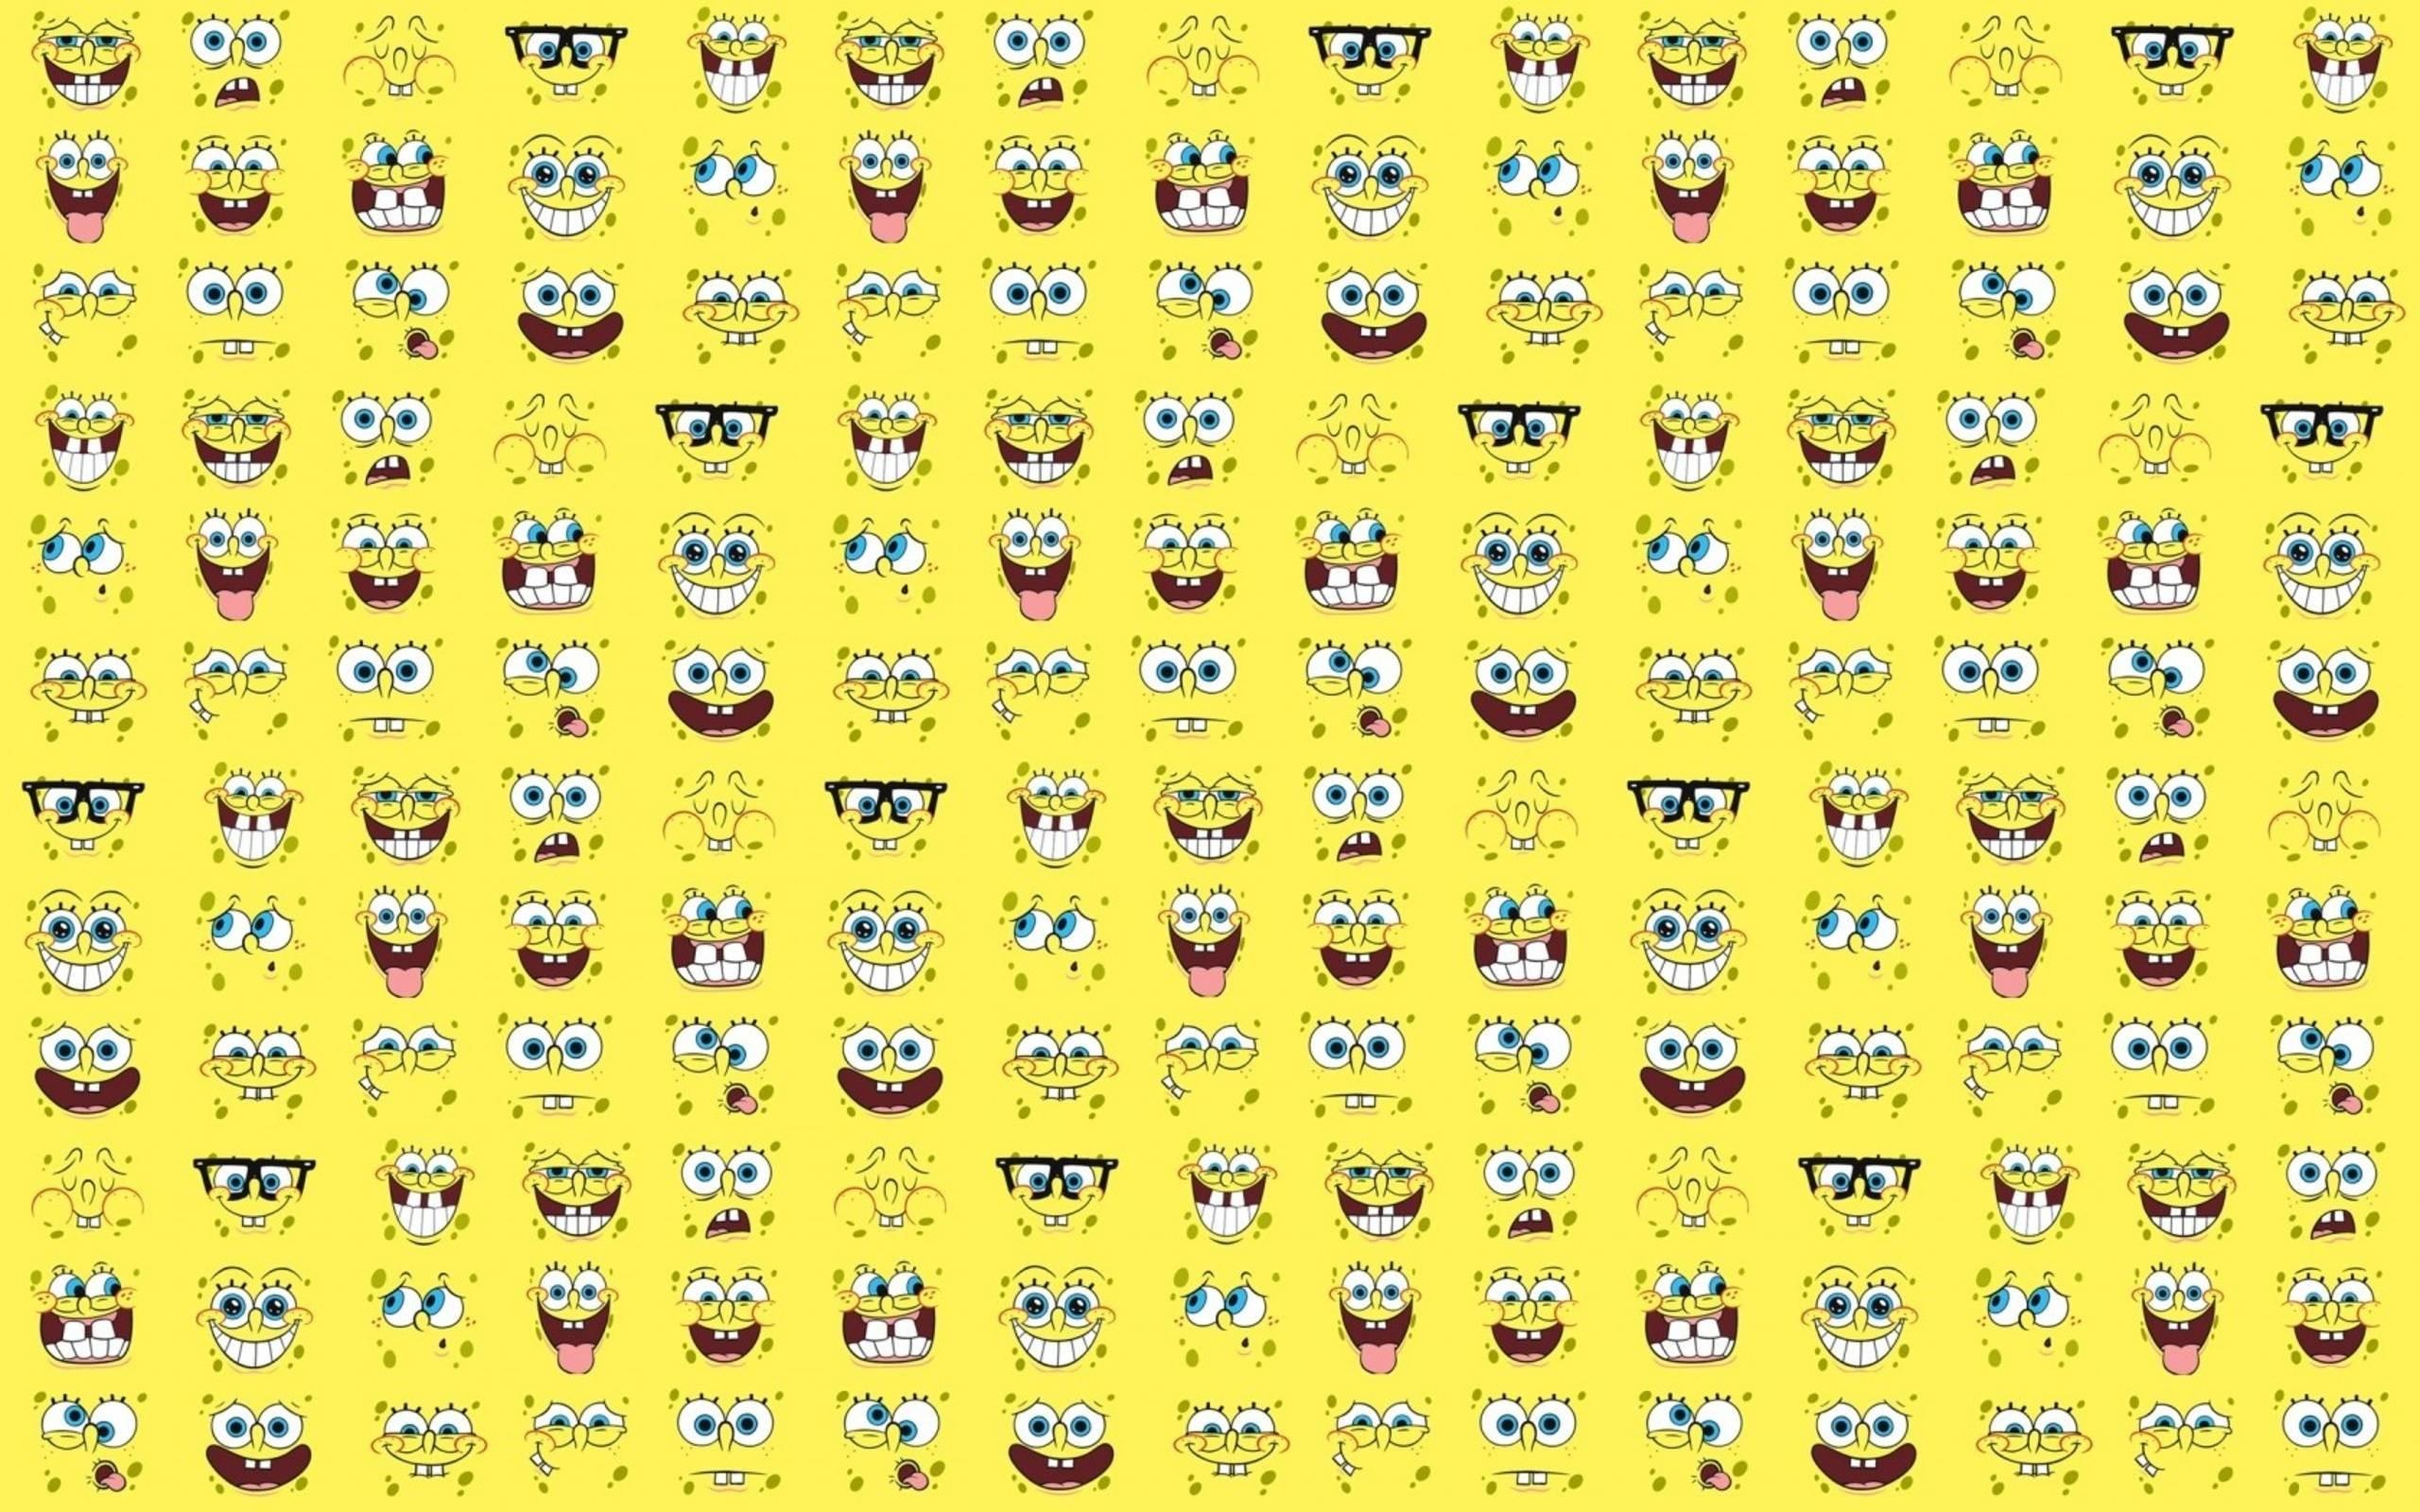 spongebob wallpaper | spongebob wallpaper